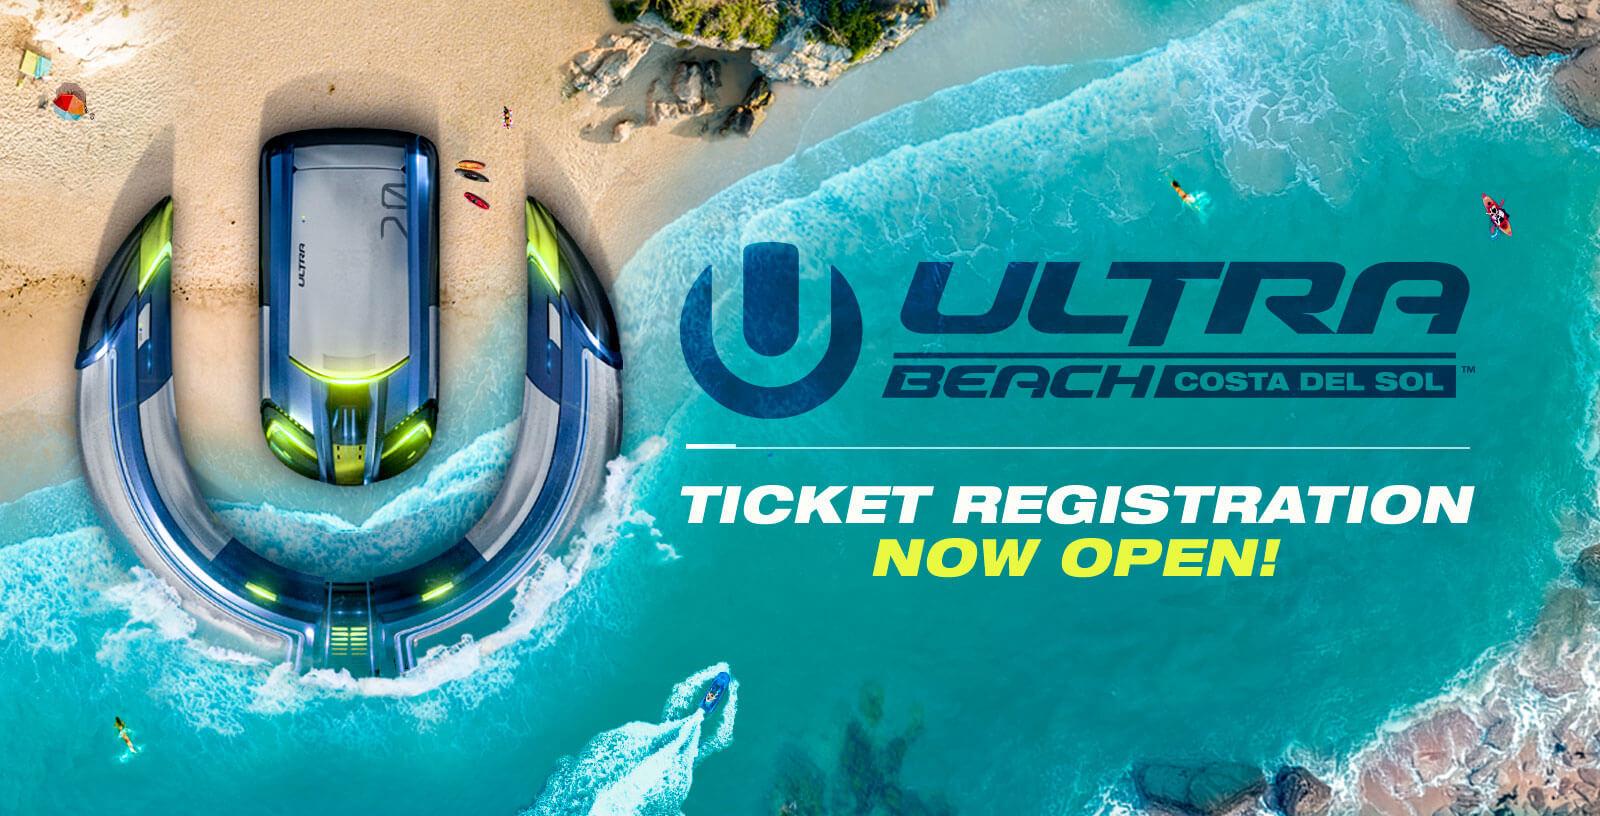 ULTRA BEACH Costa del Sol to Debut June 2020